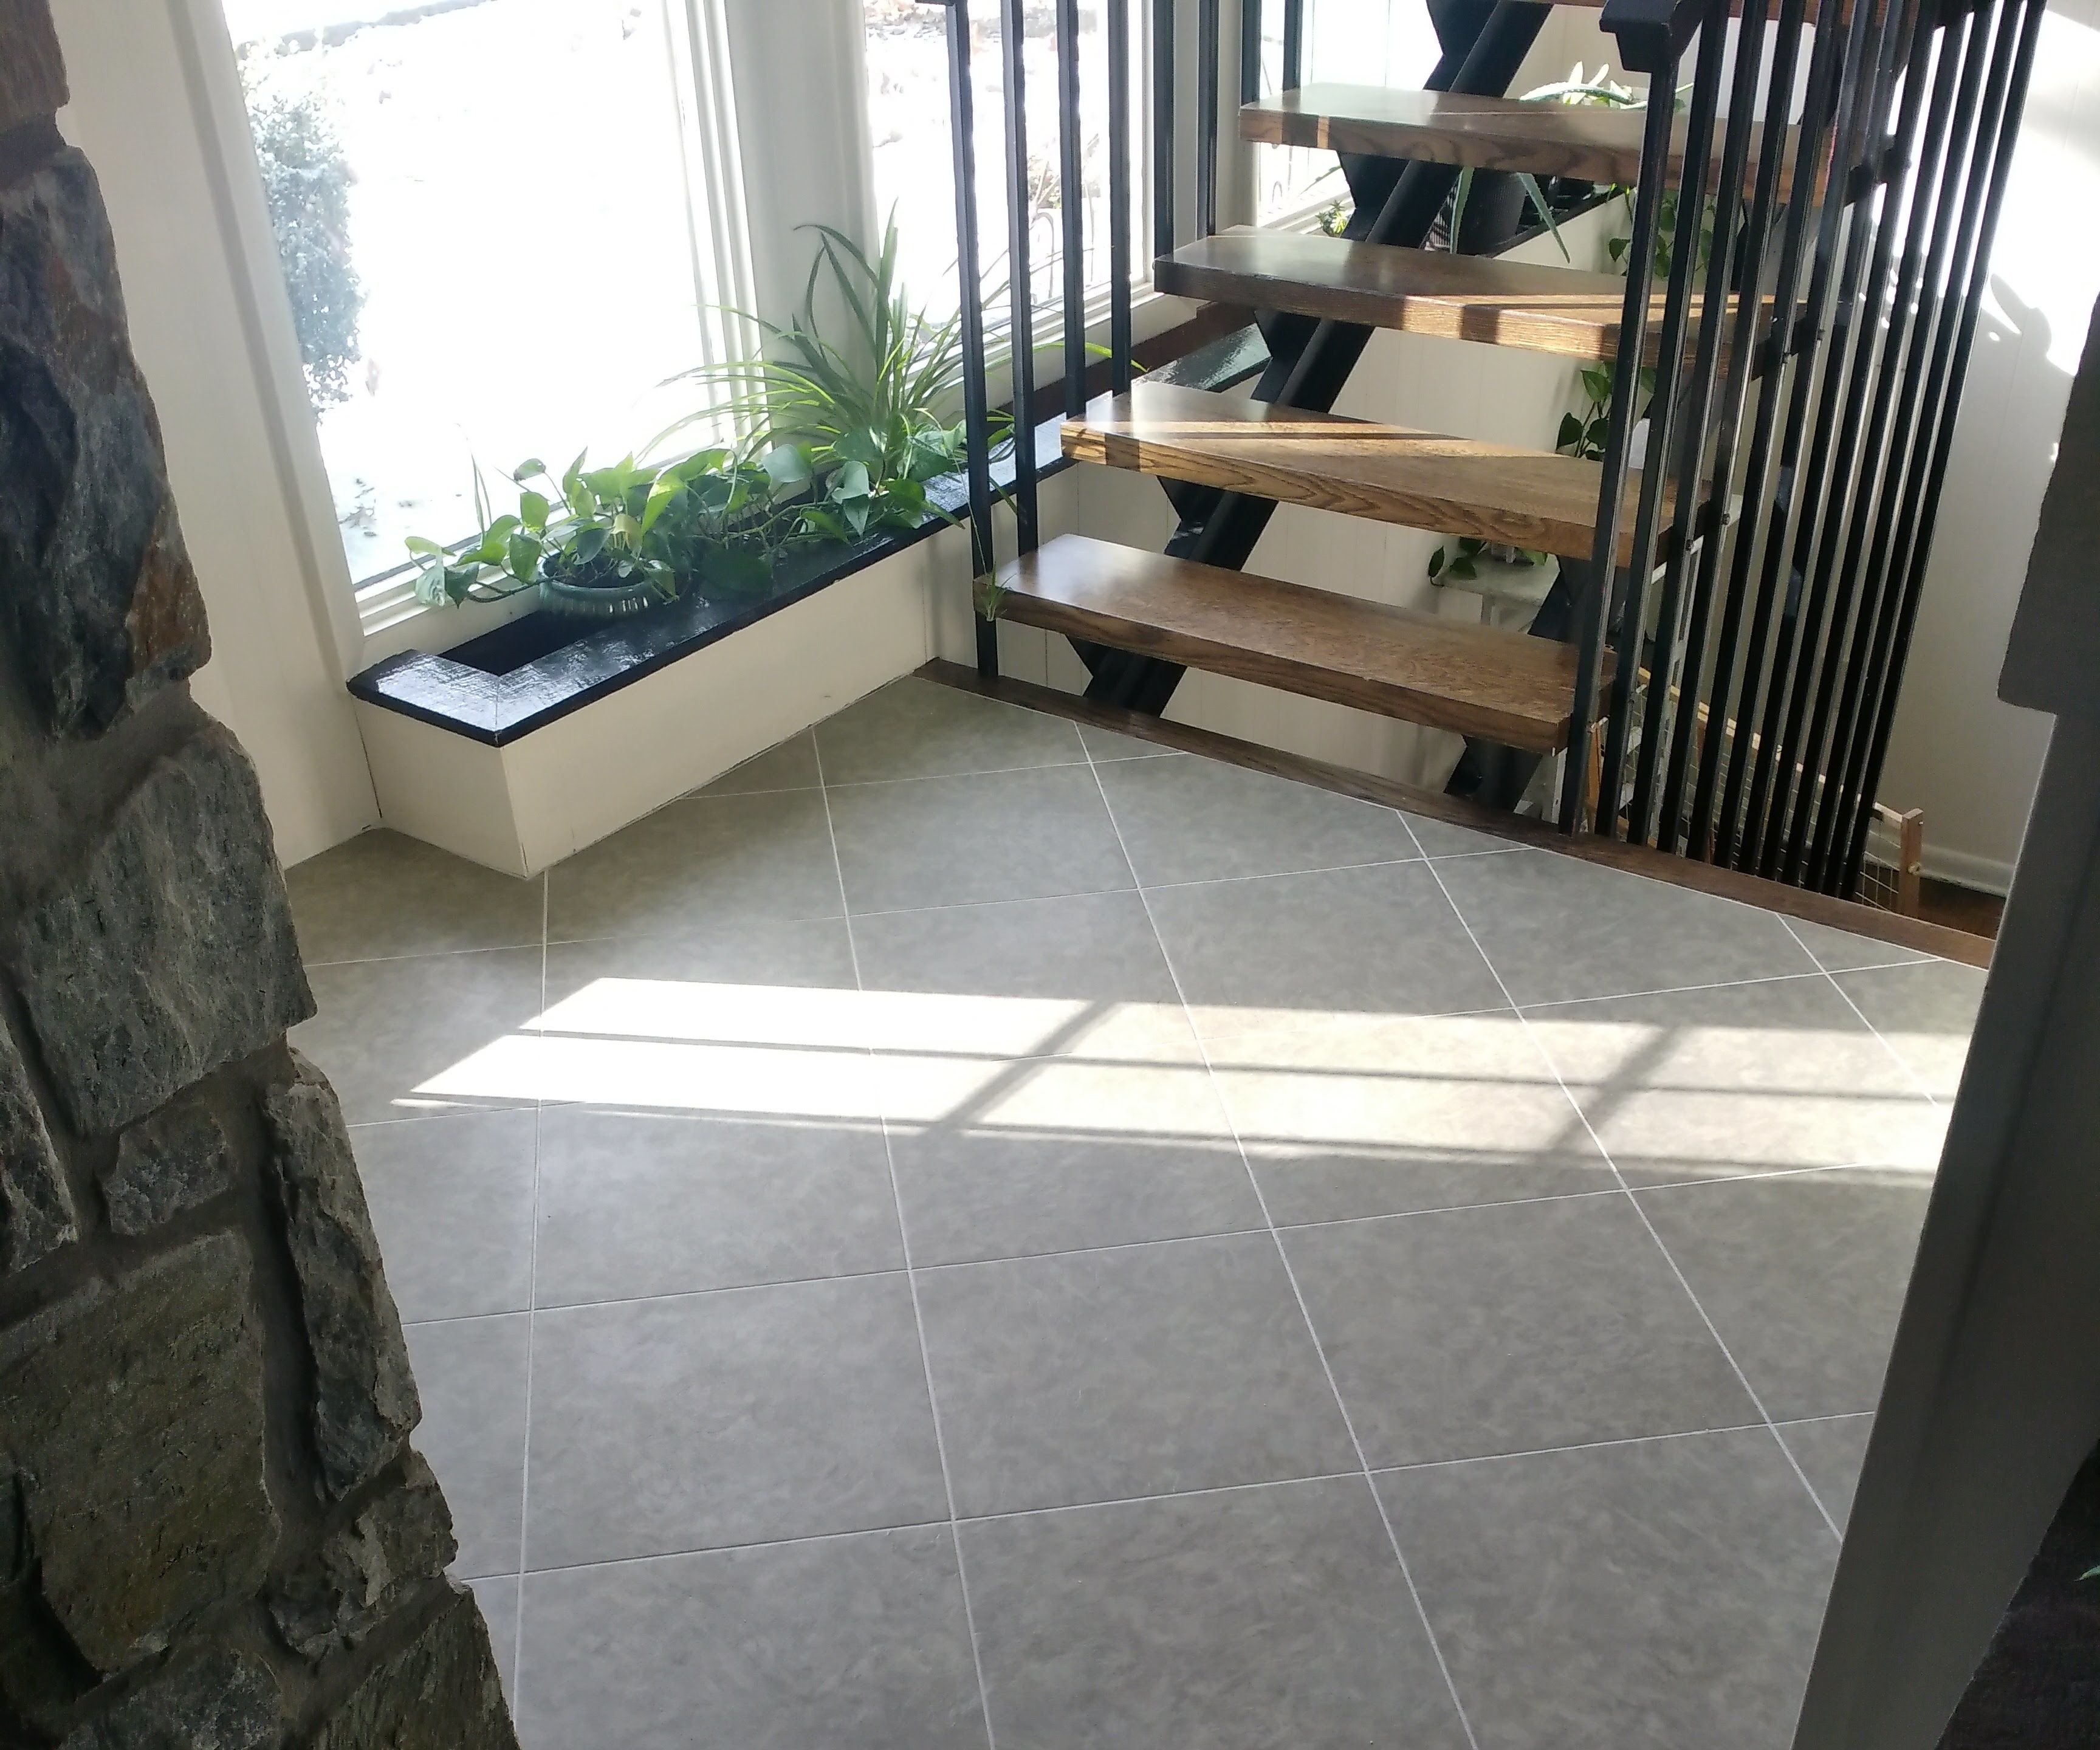 Installing a Luxury Vinyl Tile Floor